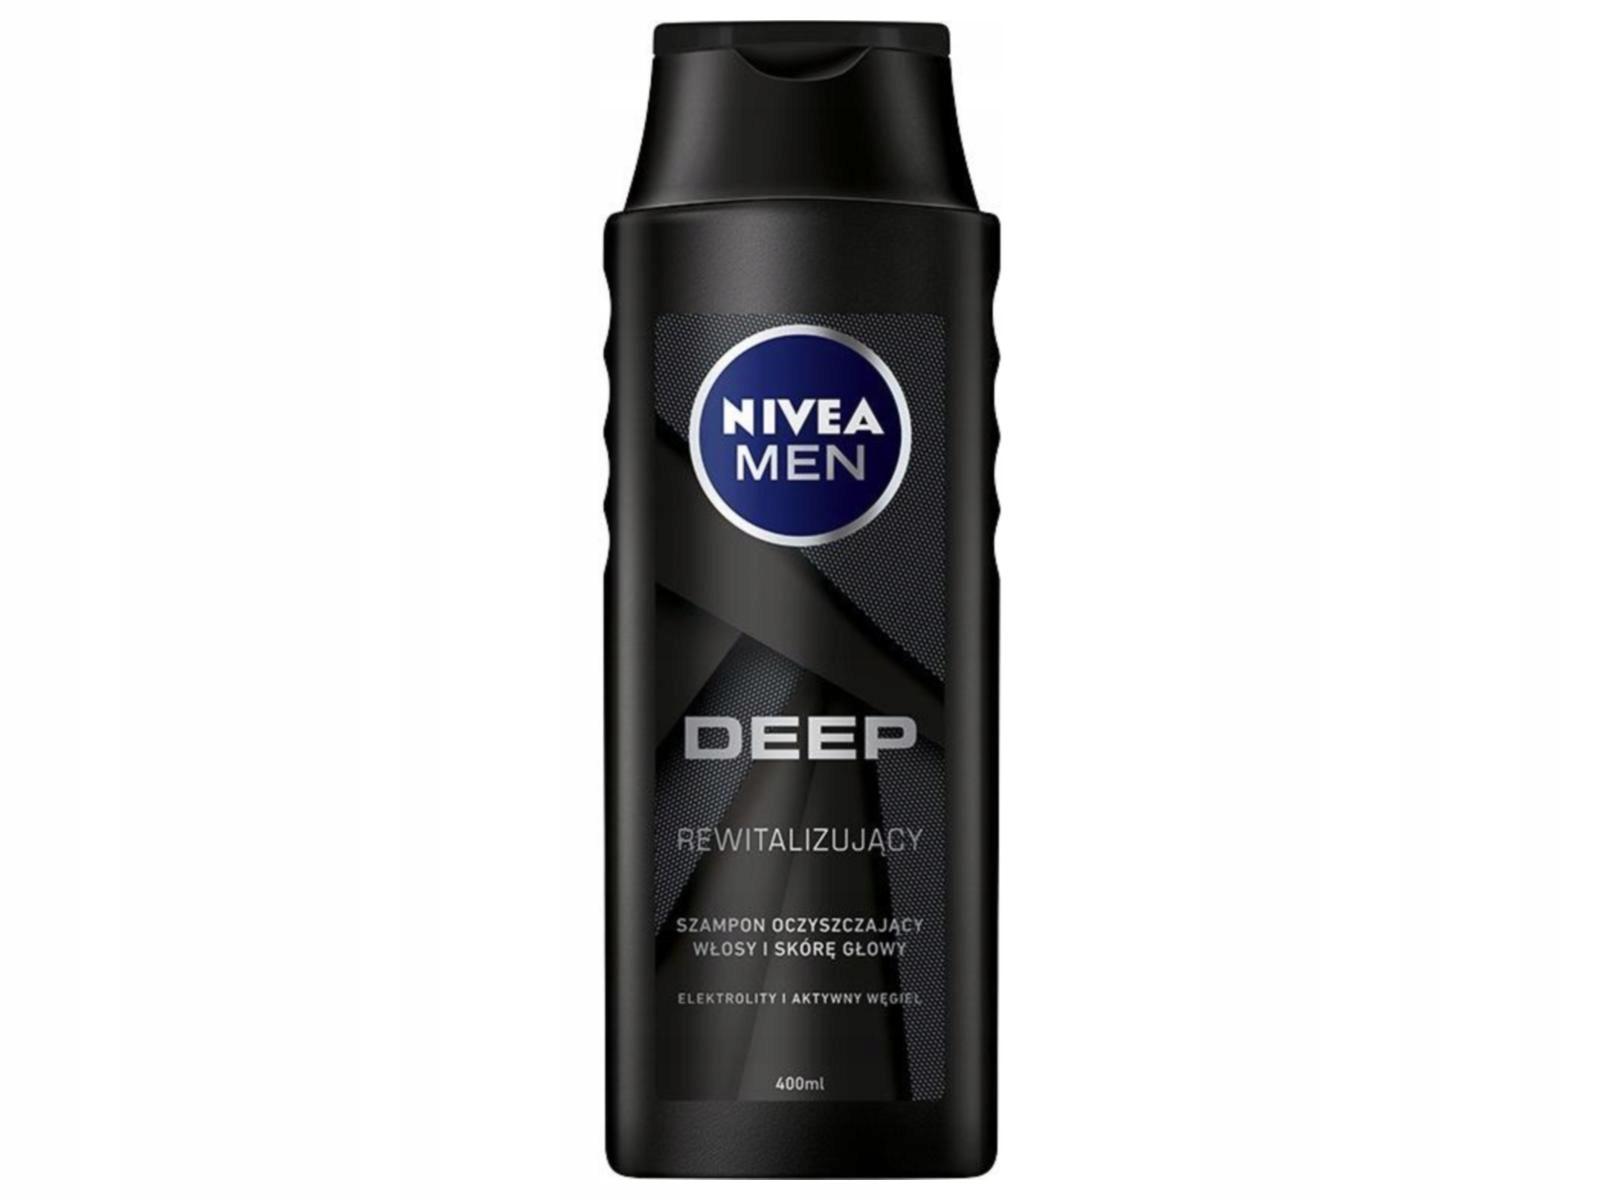 NIVEA Men Szampon DEEP rewitalizujący for 400ml